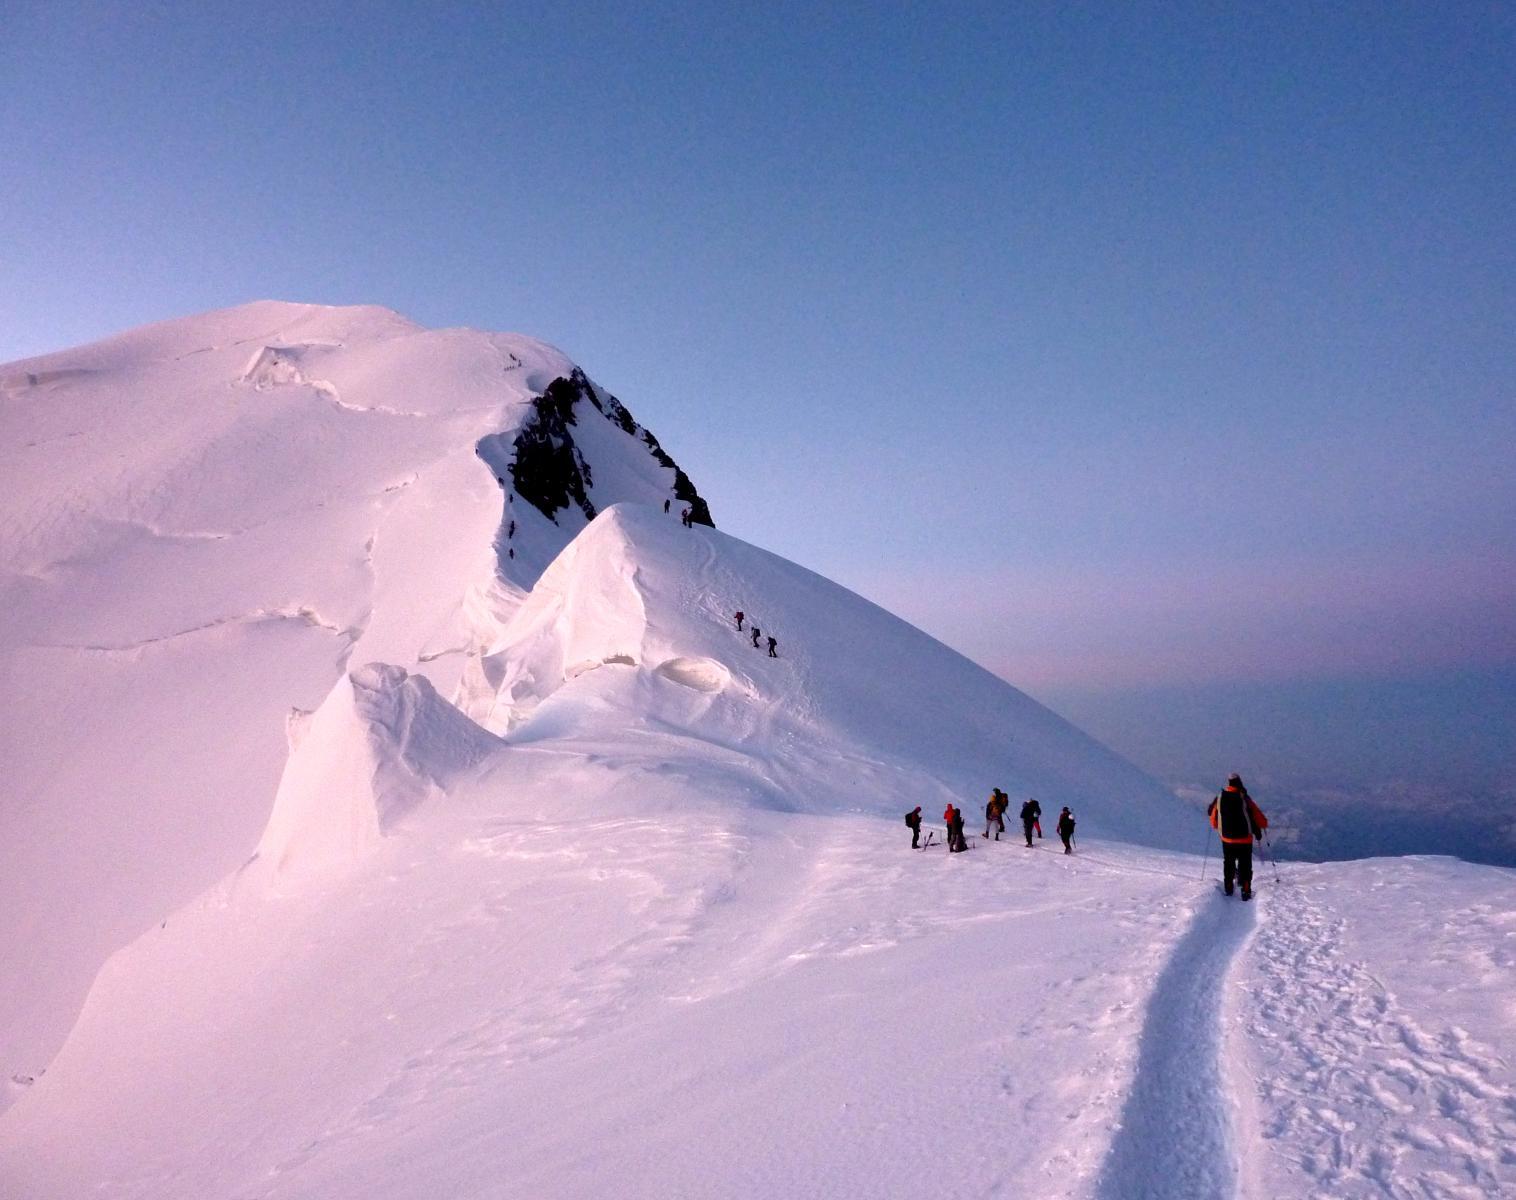 France  OBJECTIF MONT-BLANC 4810M   Alpinisme